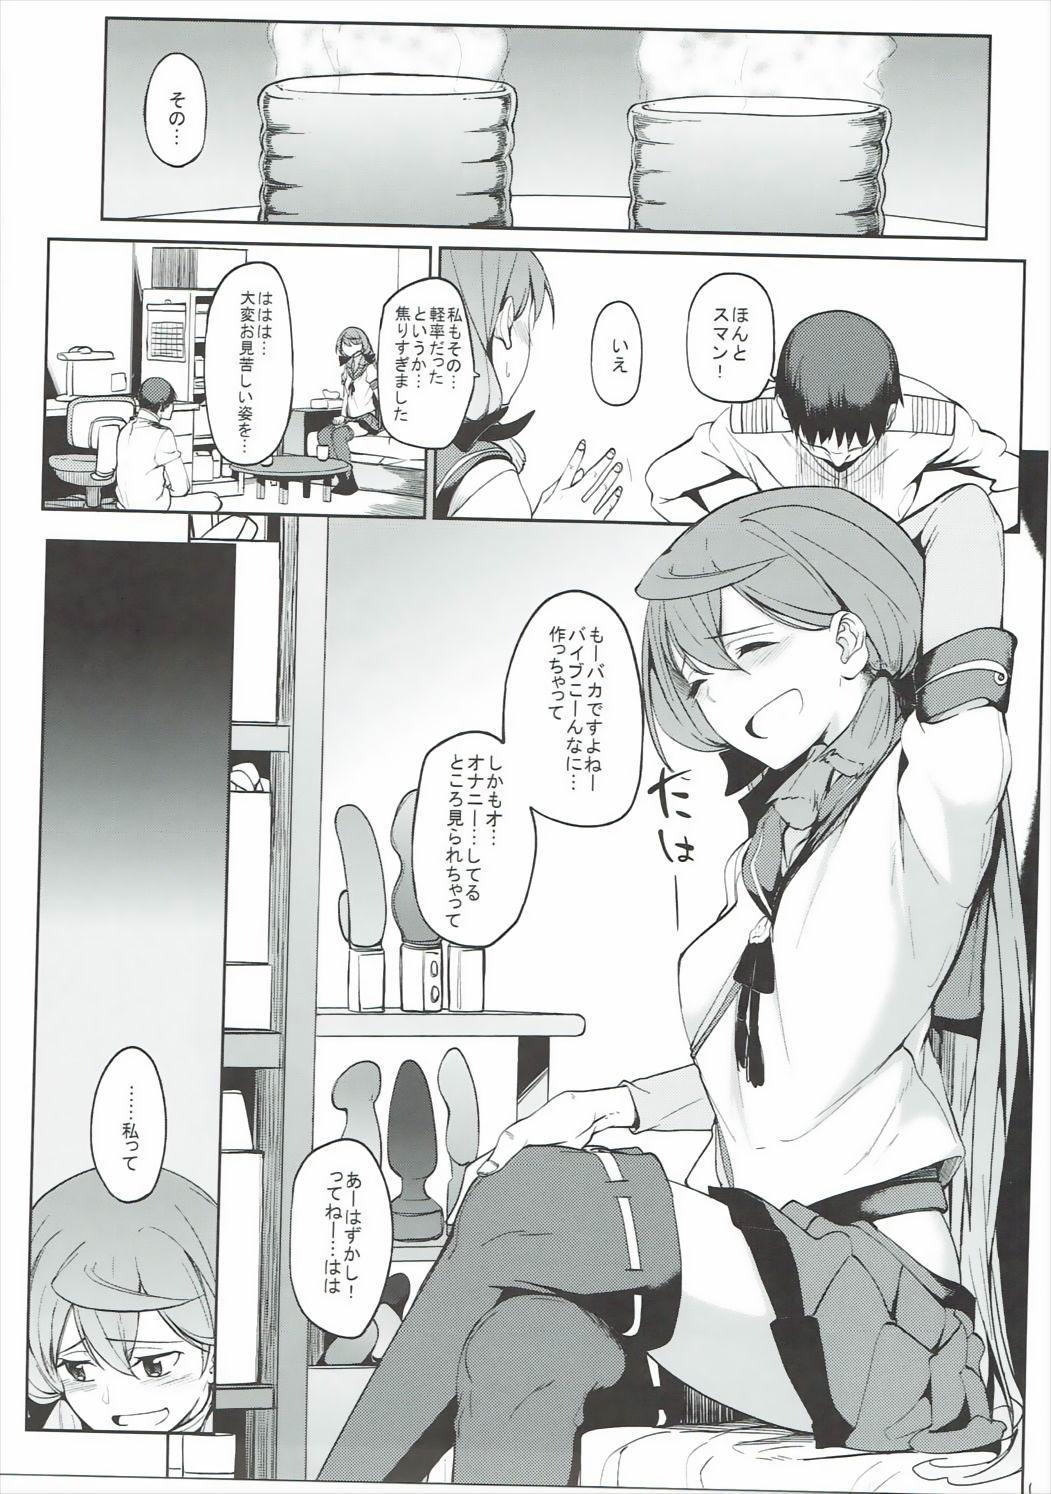 Akashi Vibration 2 5